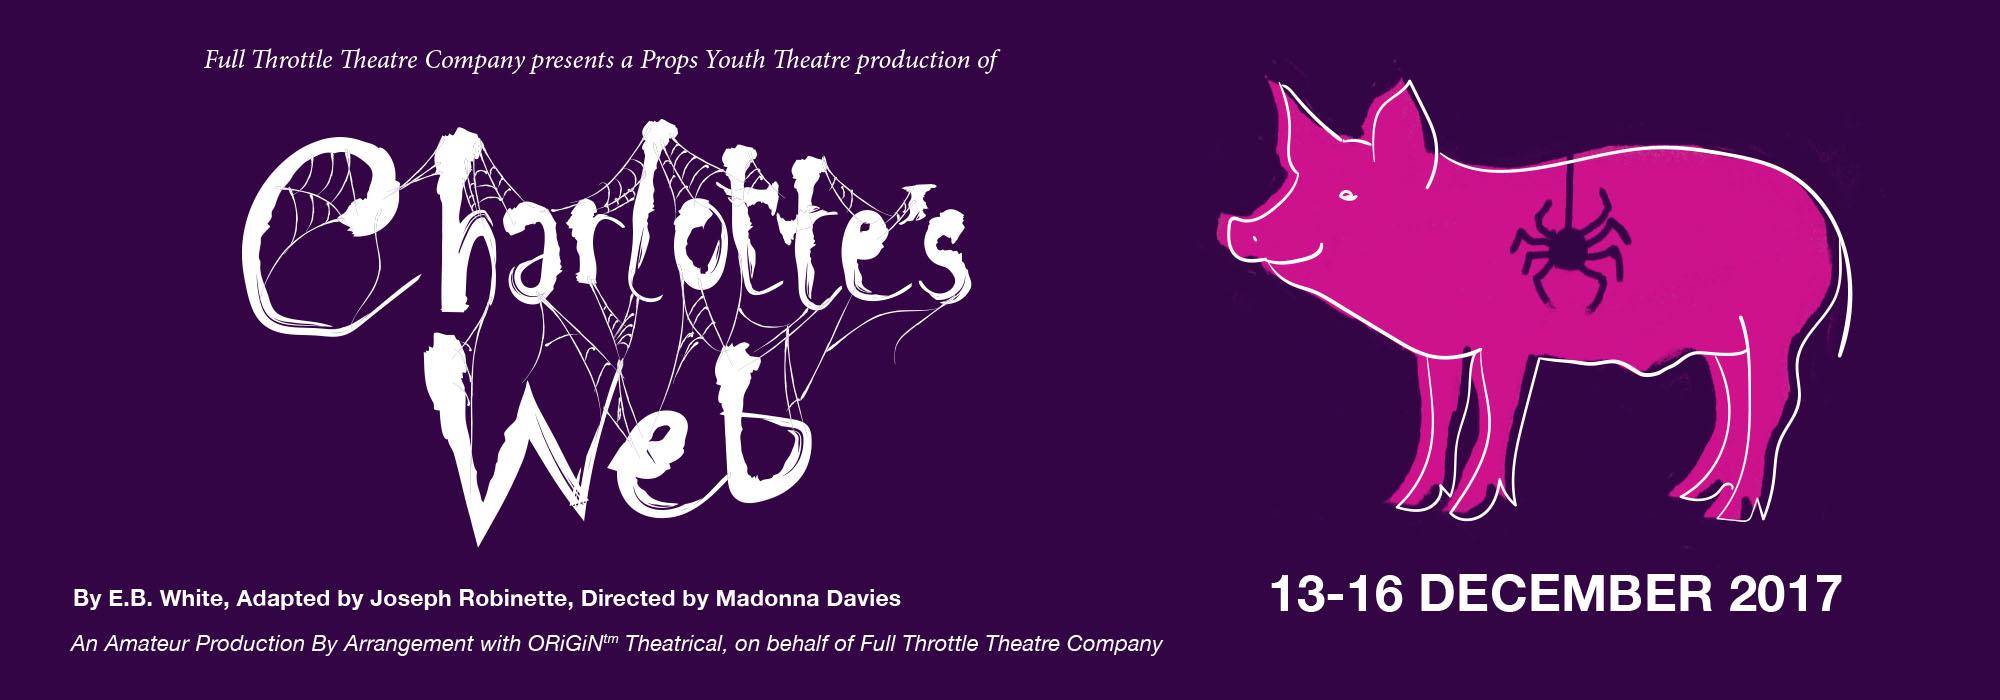 Charlotte's Web  - Full Throttle Theatre production